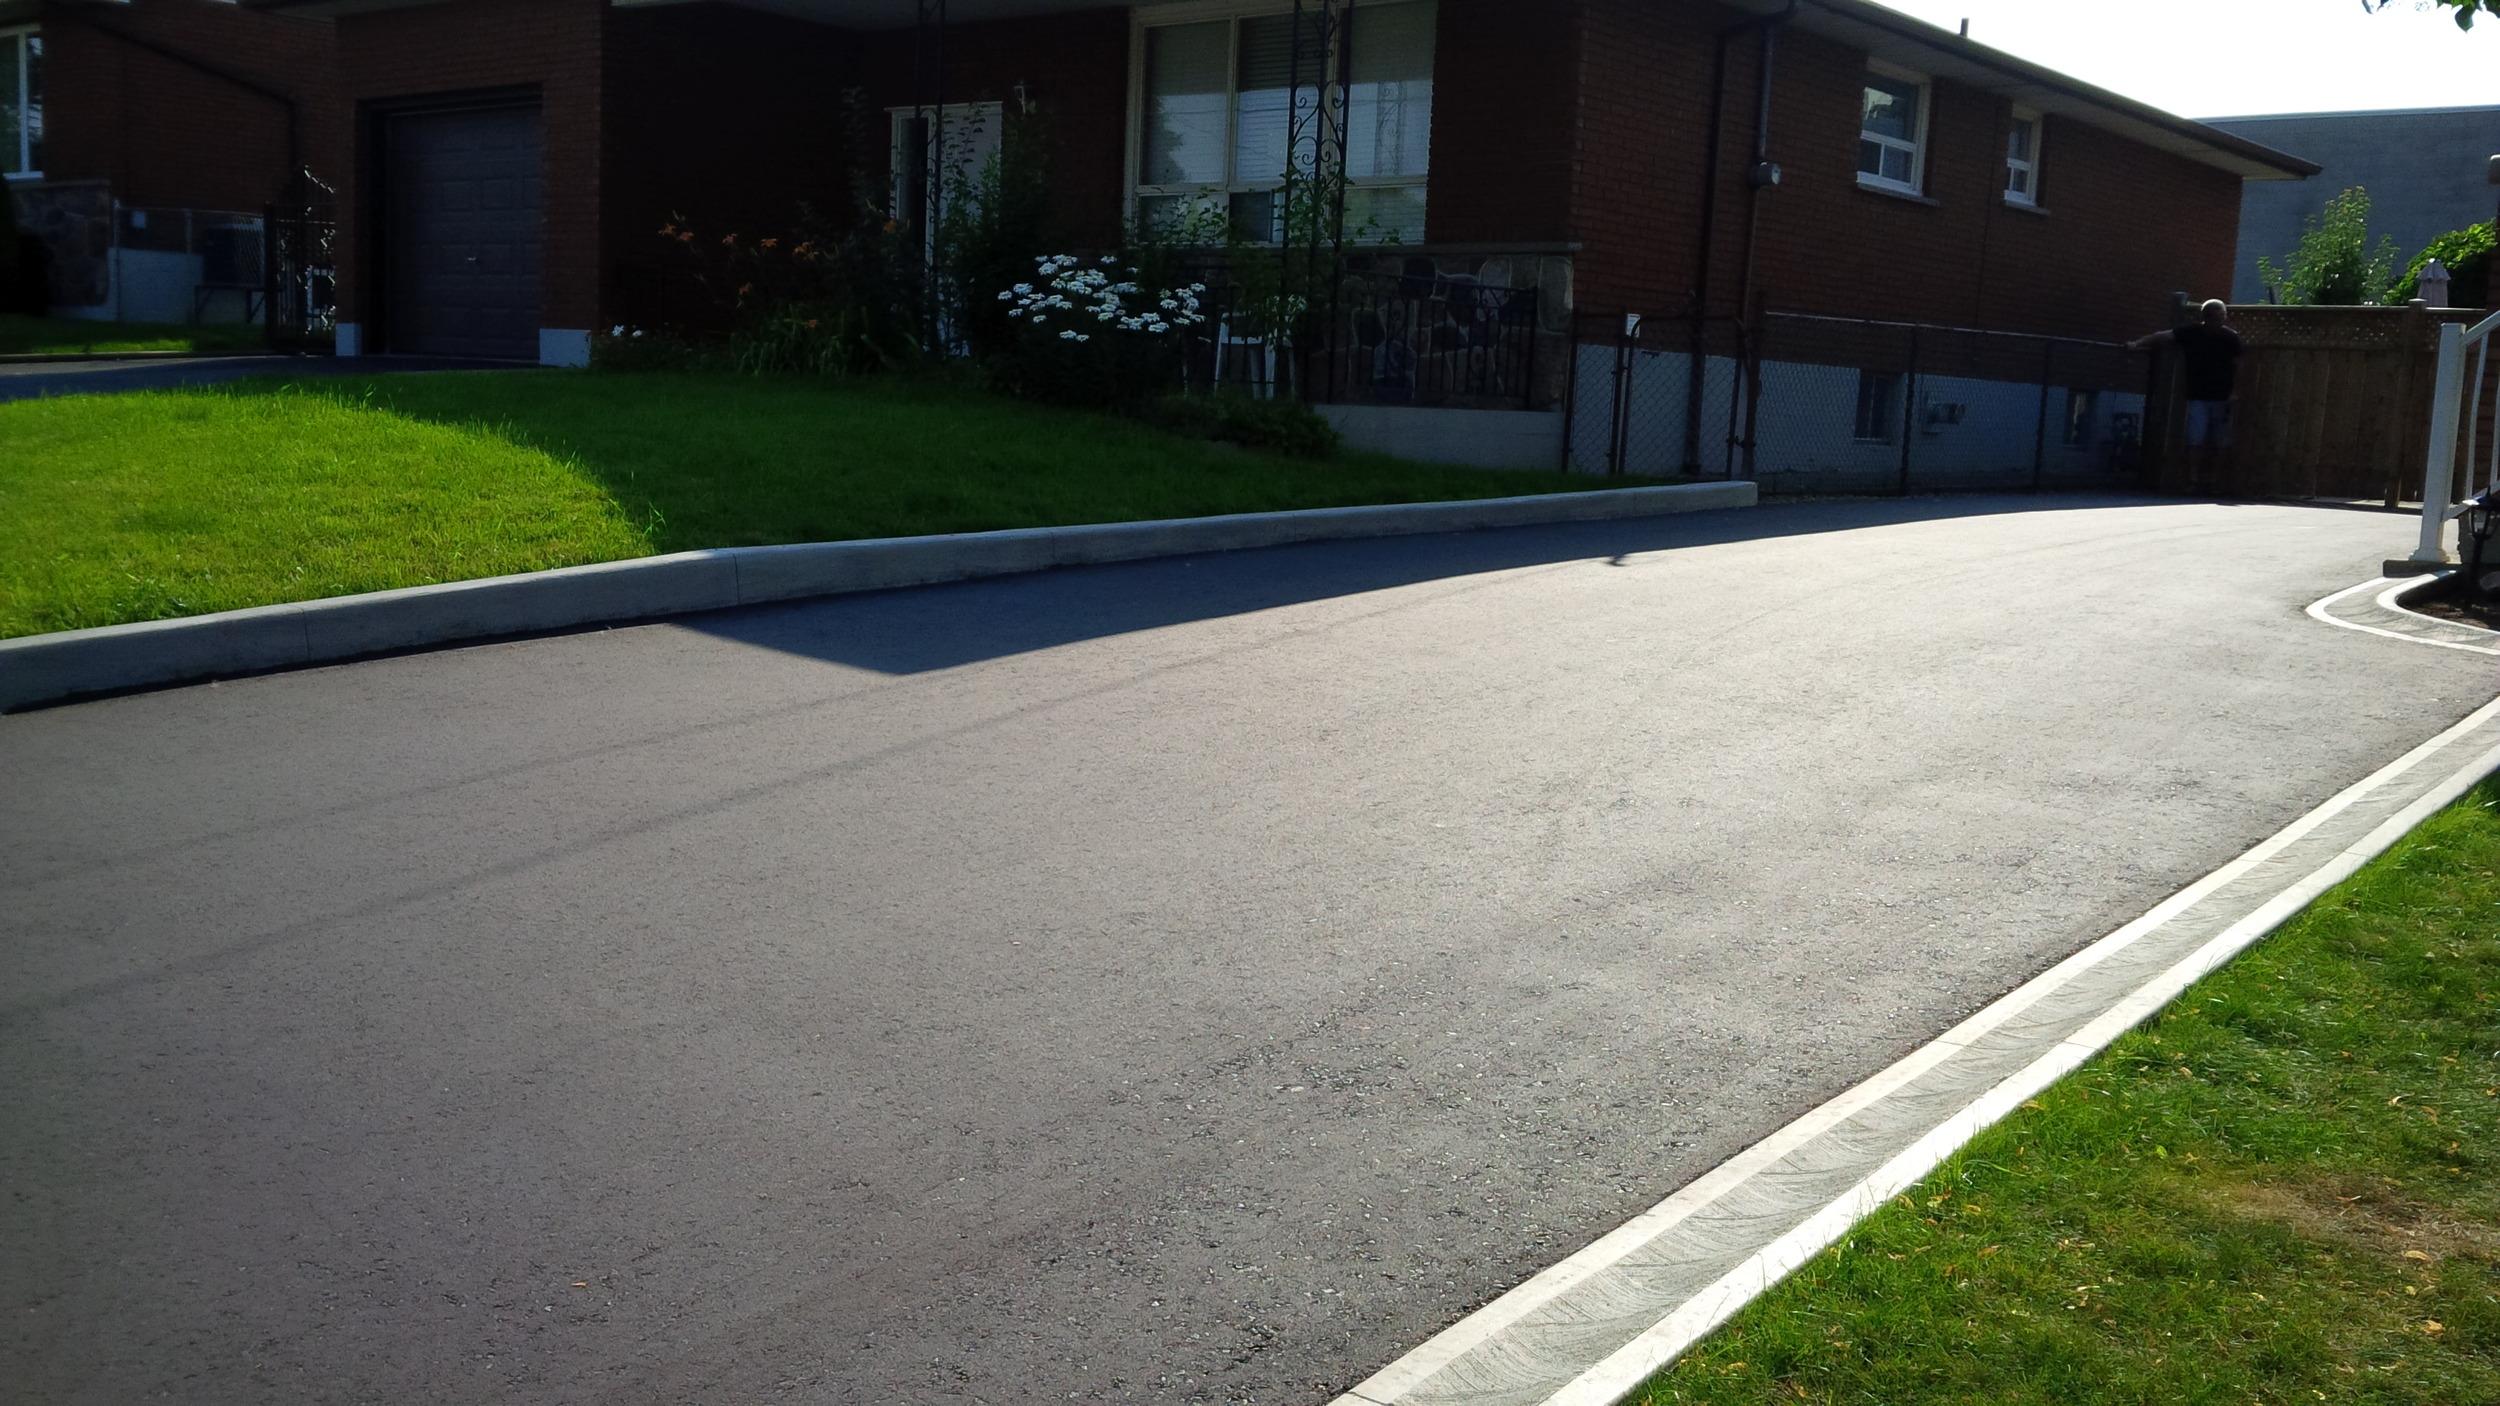 Asphalt drive way with concrete curbing.